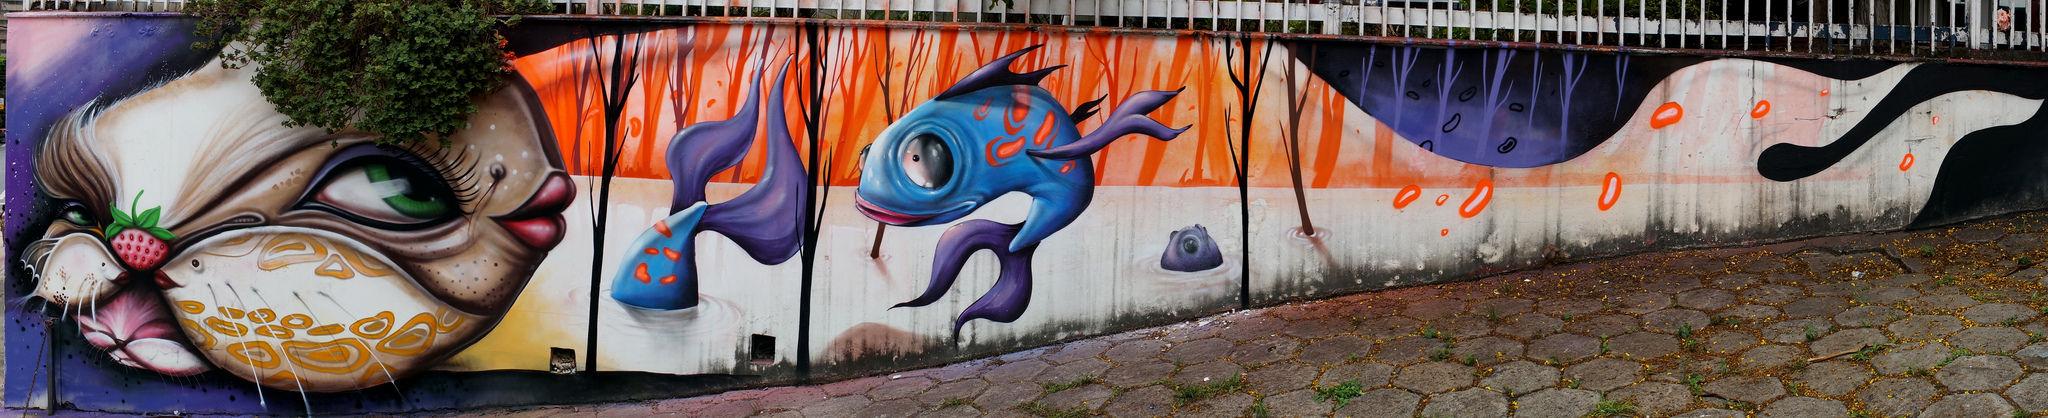 Artwork By Dalata, DMS in Belo Horizonte